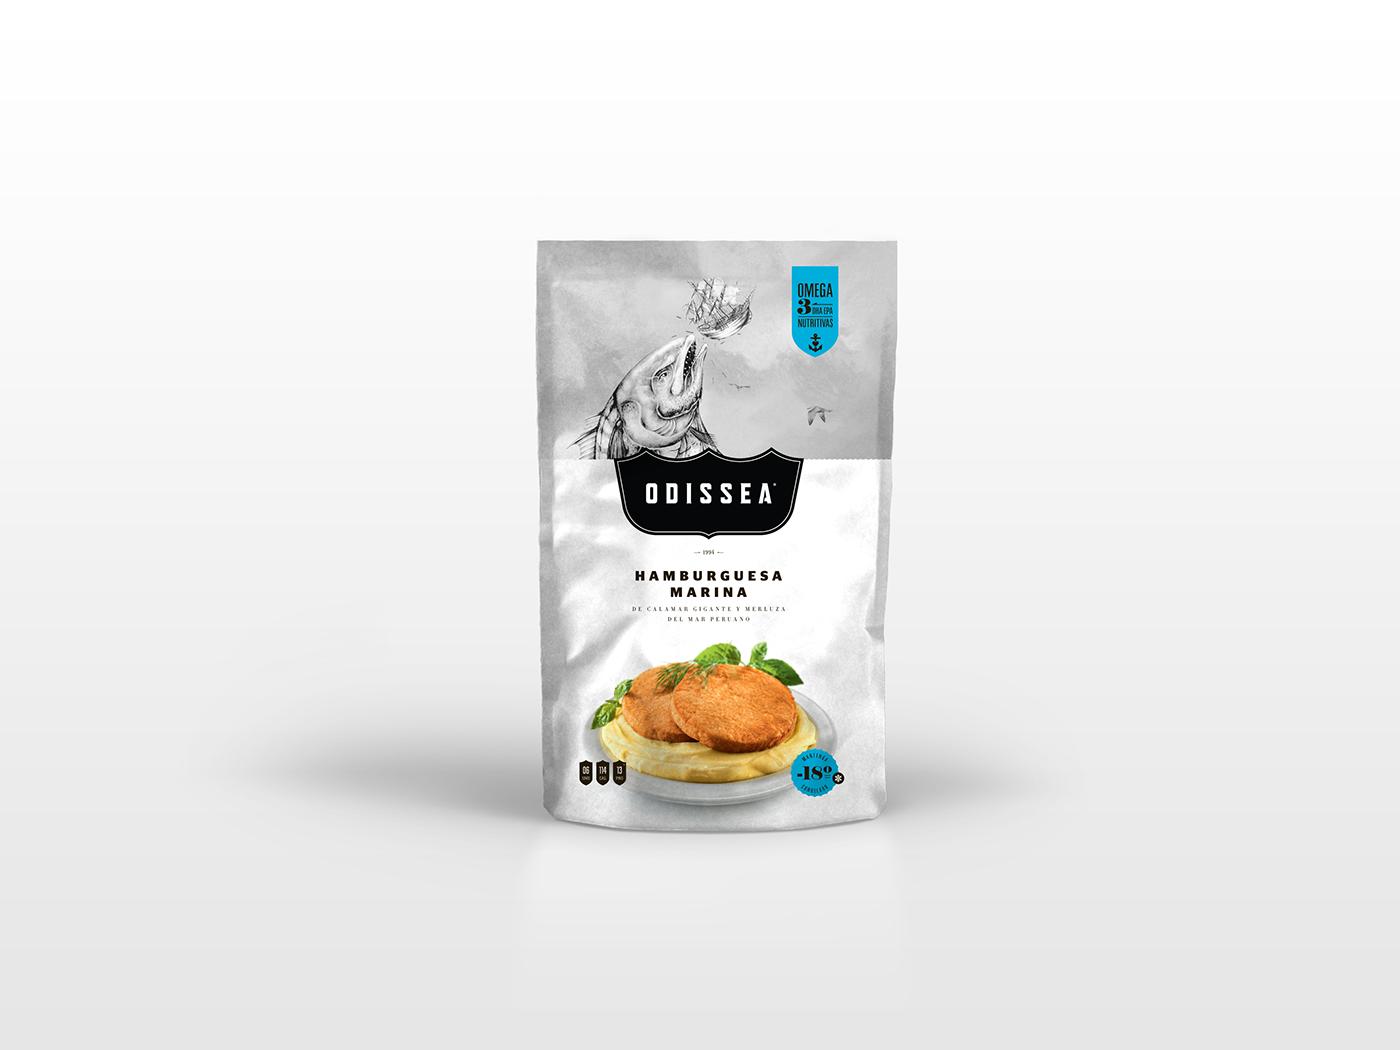 Odissea seafood packaging design CPG FMCG branding by The Brandlab in Lima, Peru